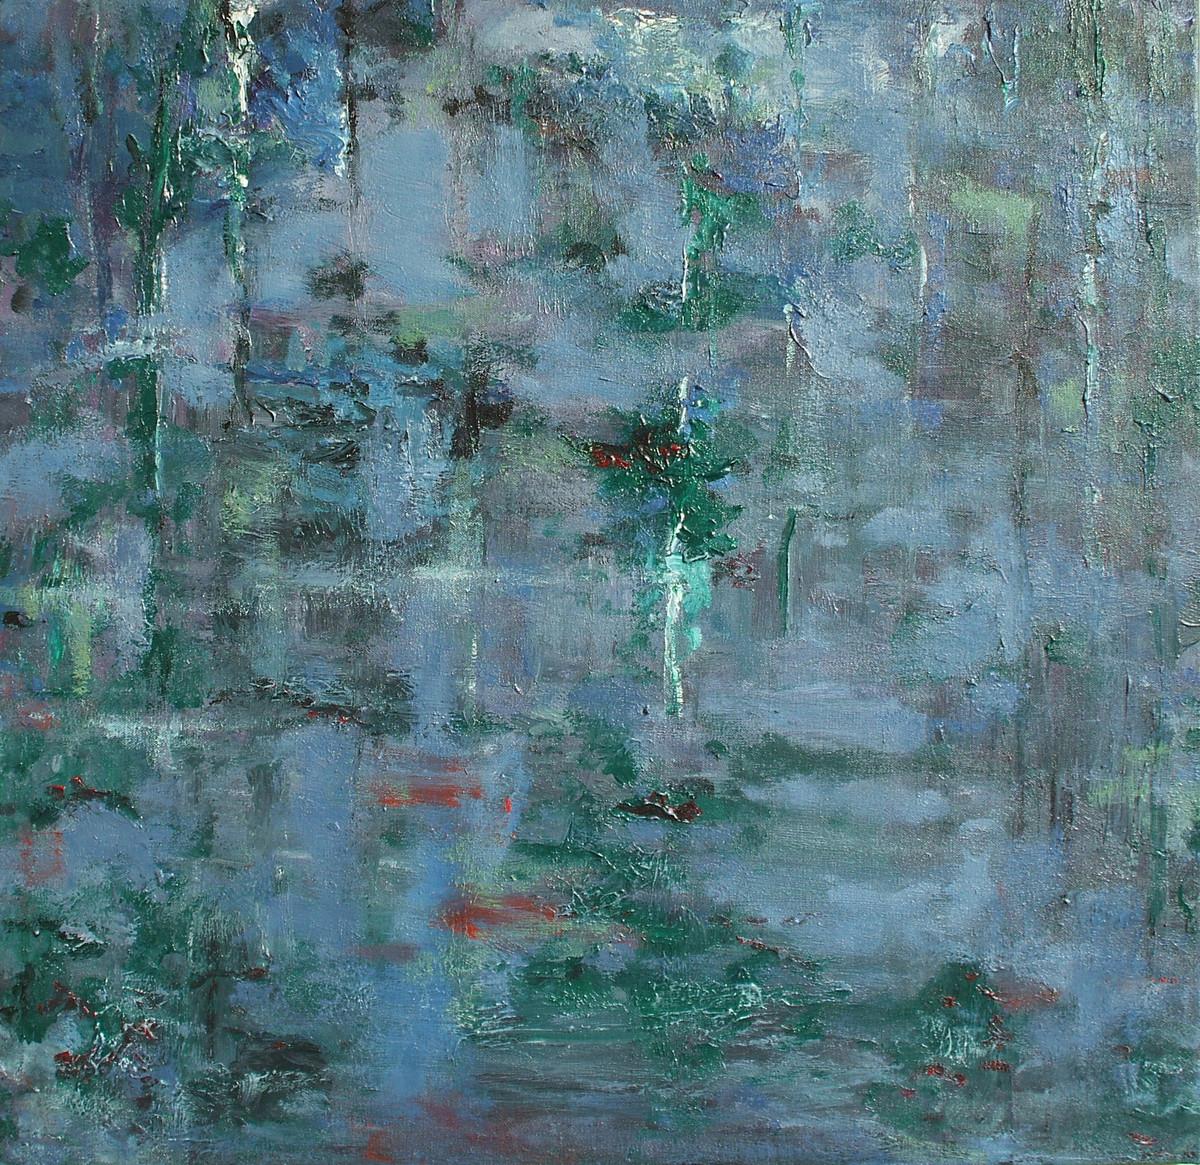 Waterscape 3 Digital Print by Animesh Roy,Impressionism, Impressionism